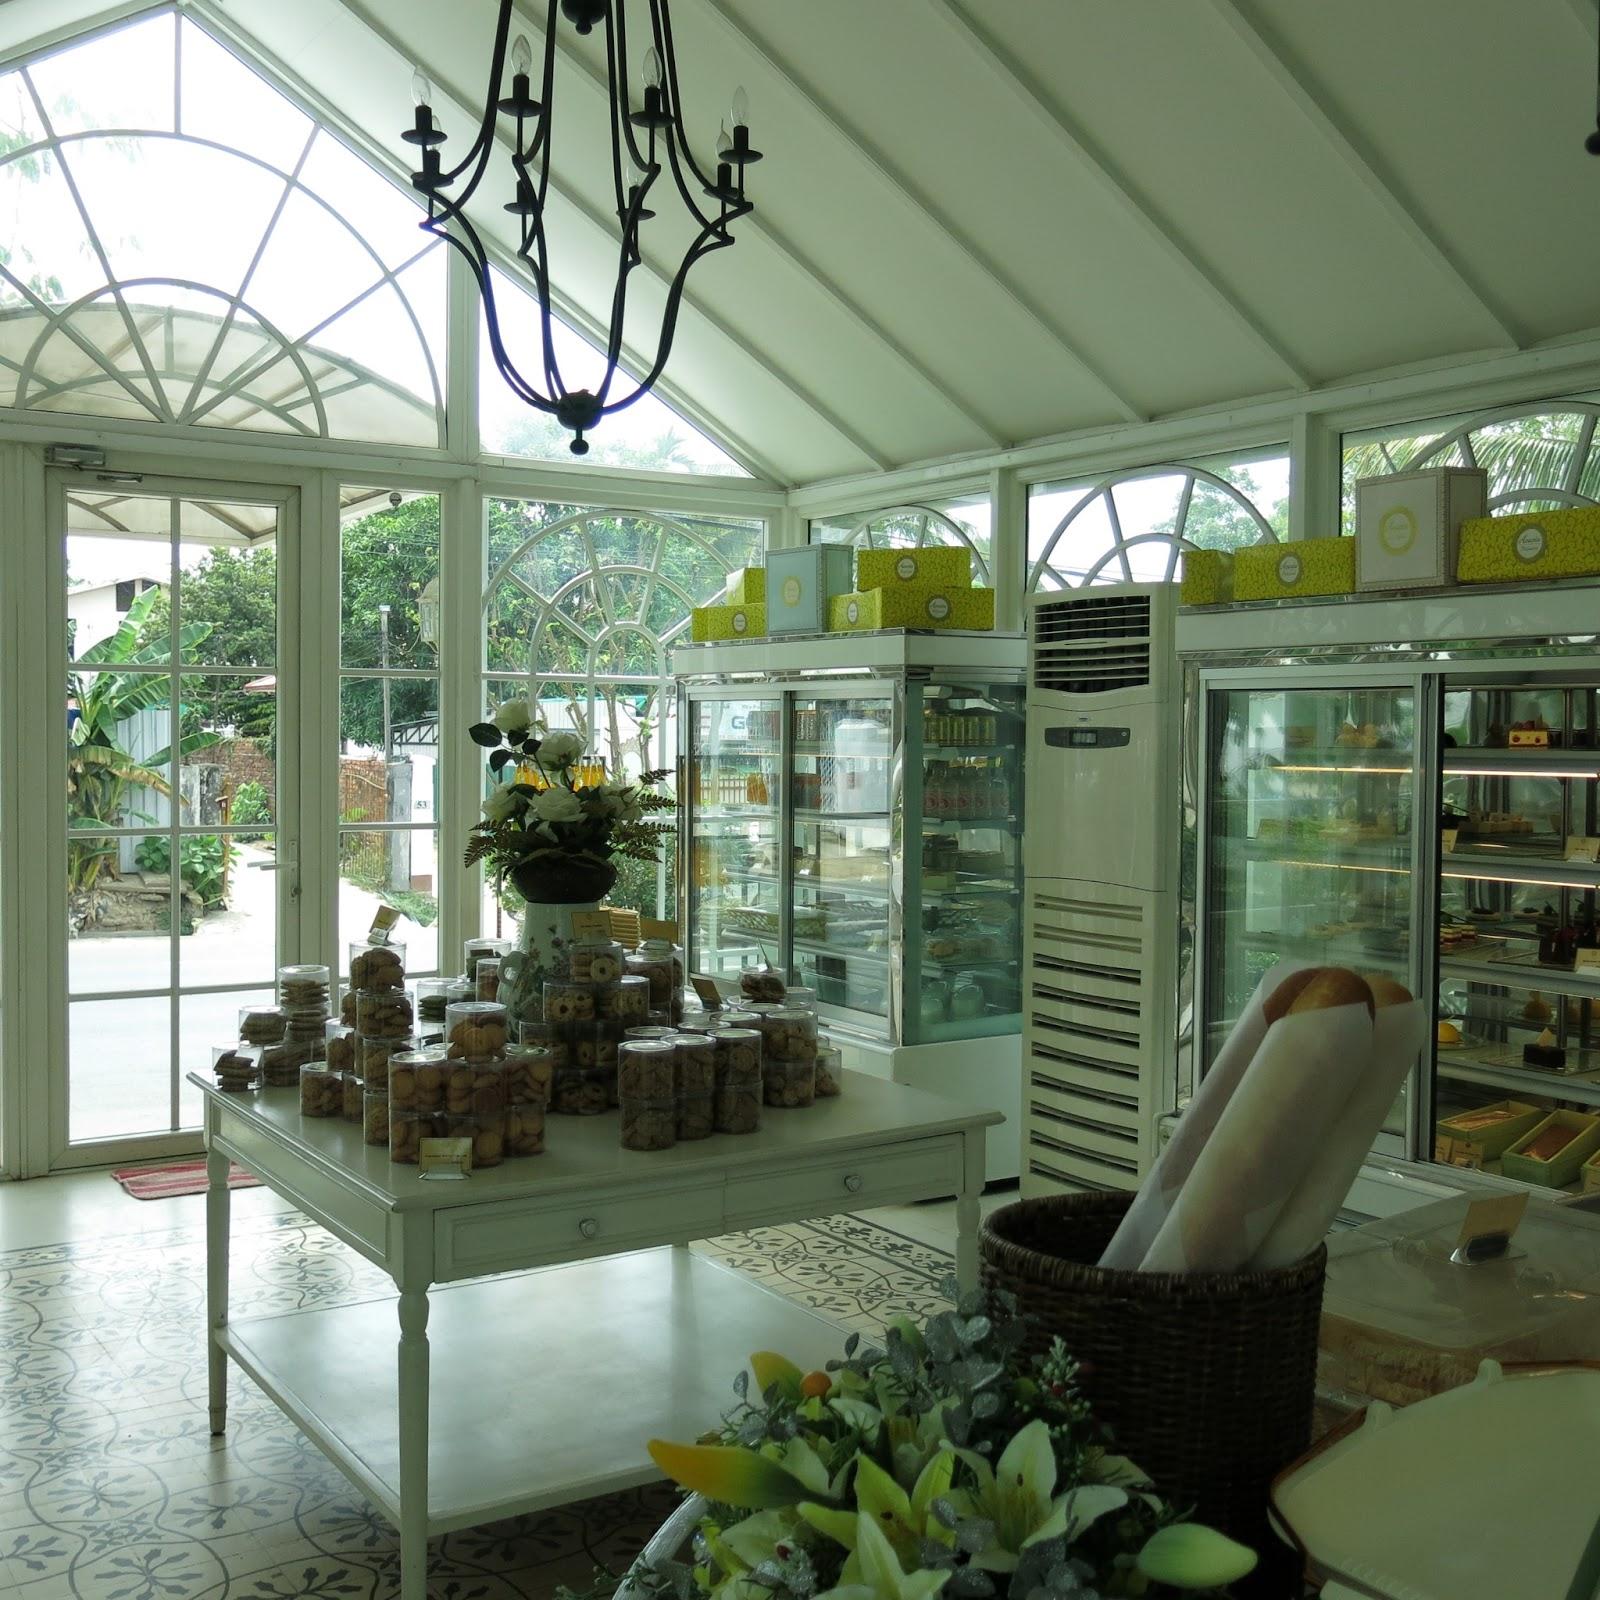 Missyimply acacia tea salon yangon myanmar for Acacia salon amherstburg